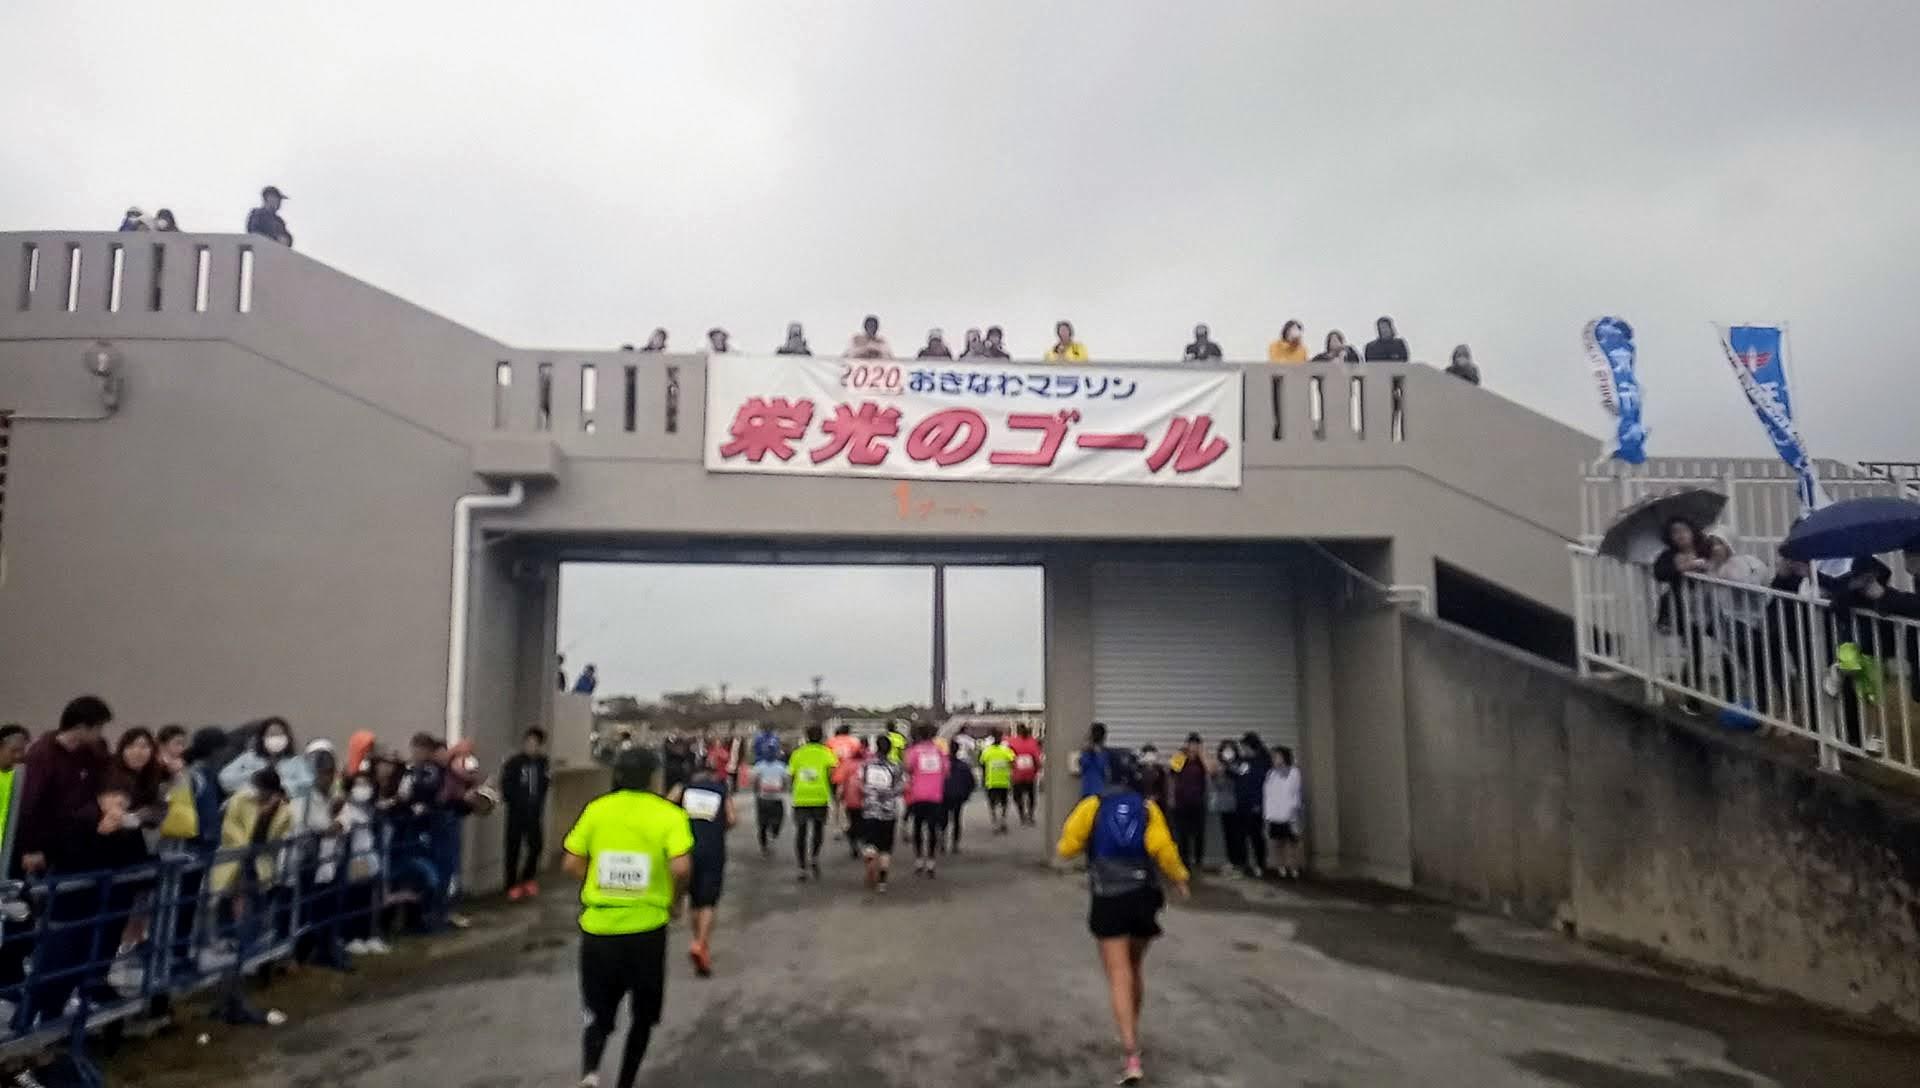 Before the Okinawa Marathon goal